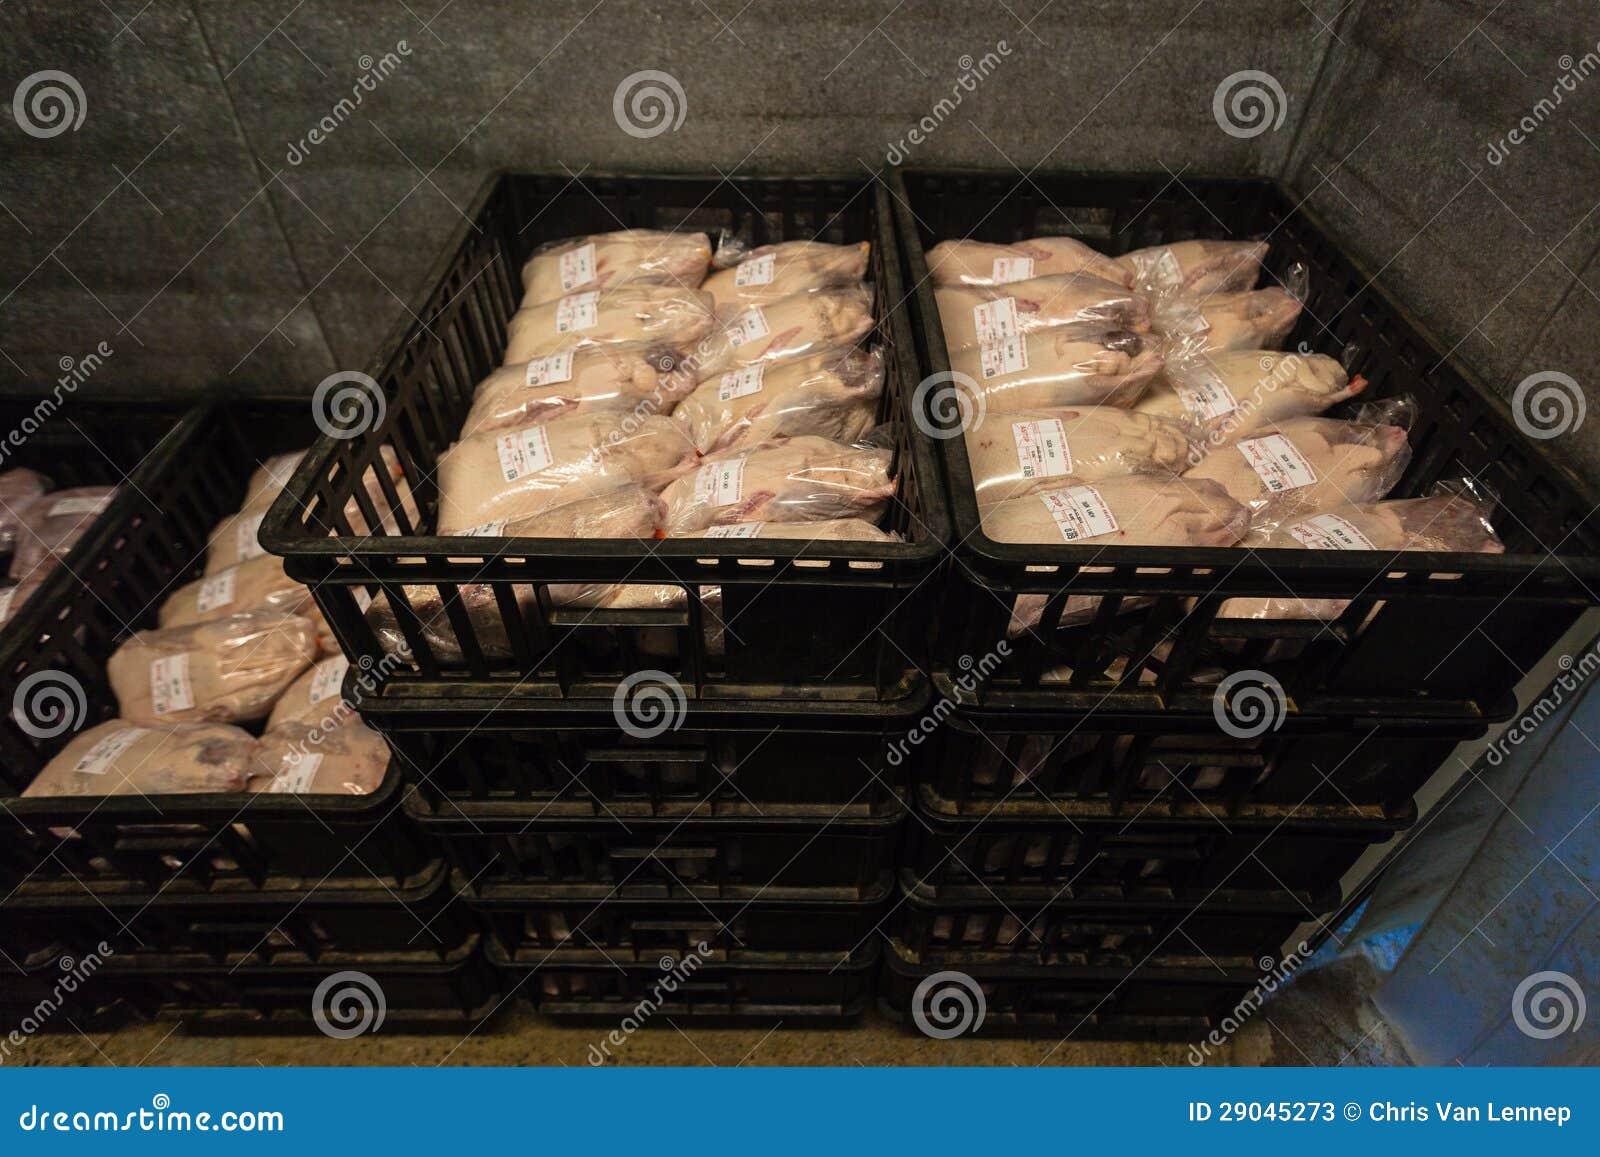 Poultry abattoir business plan